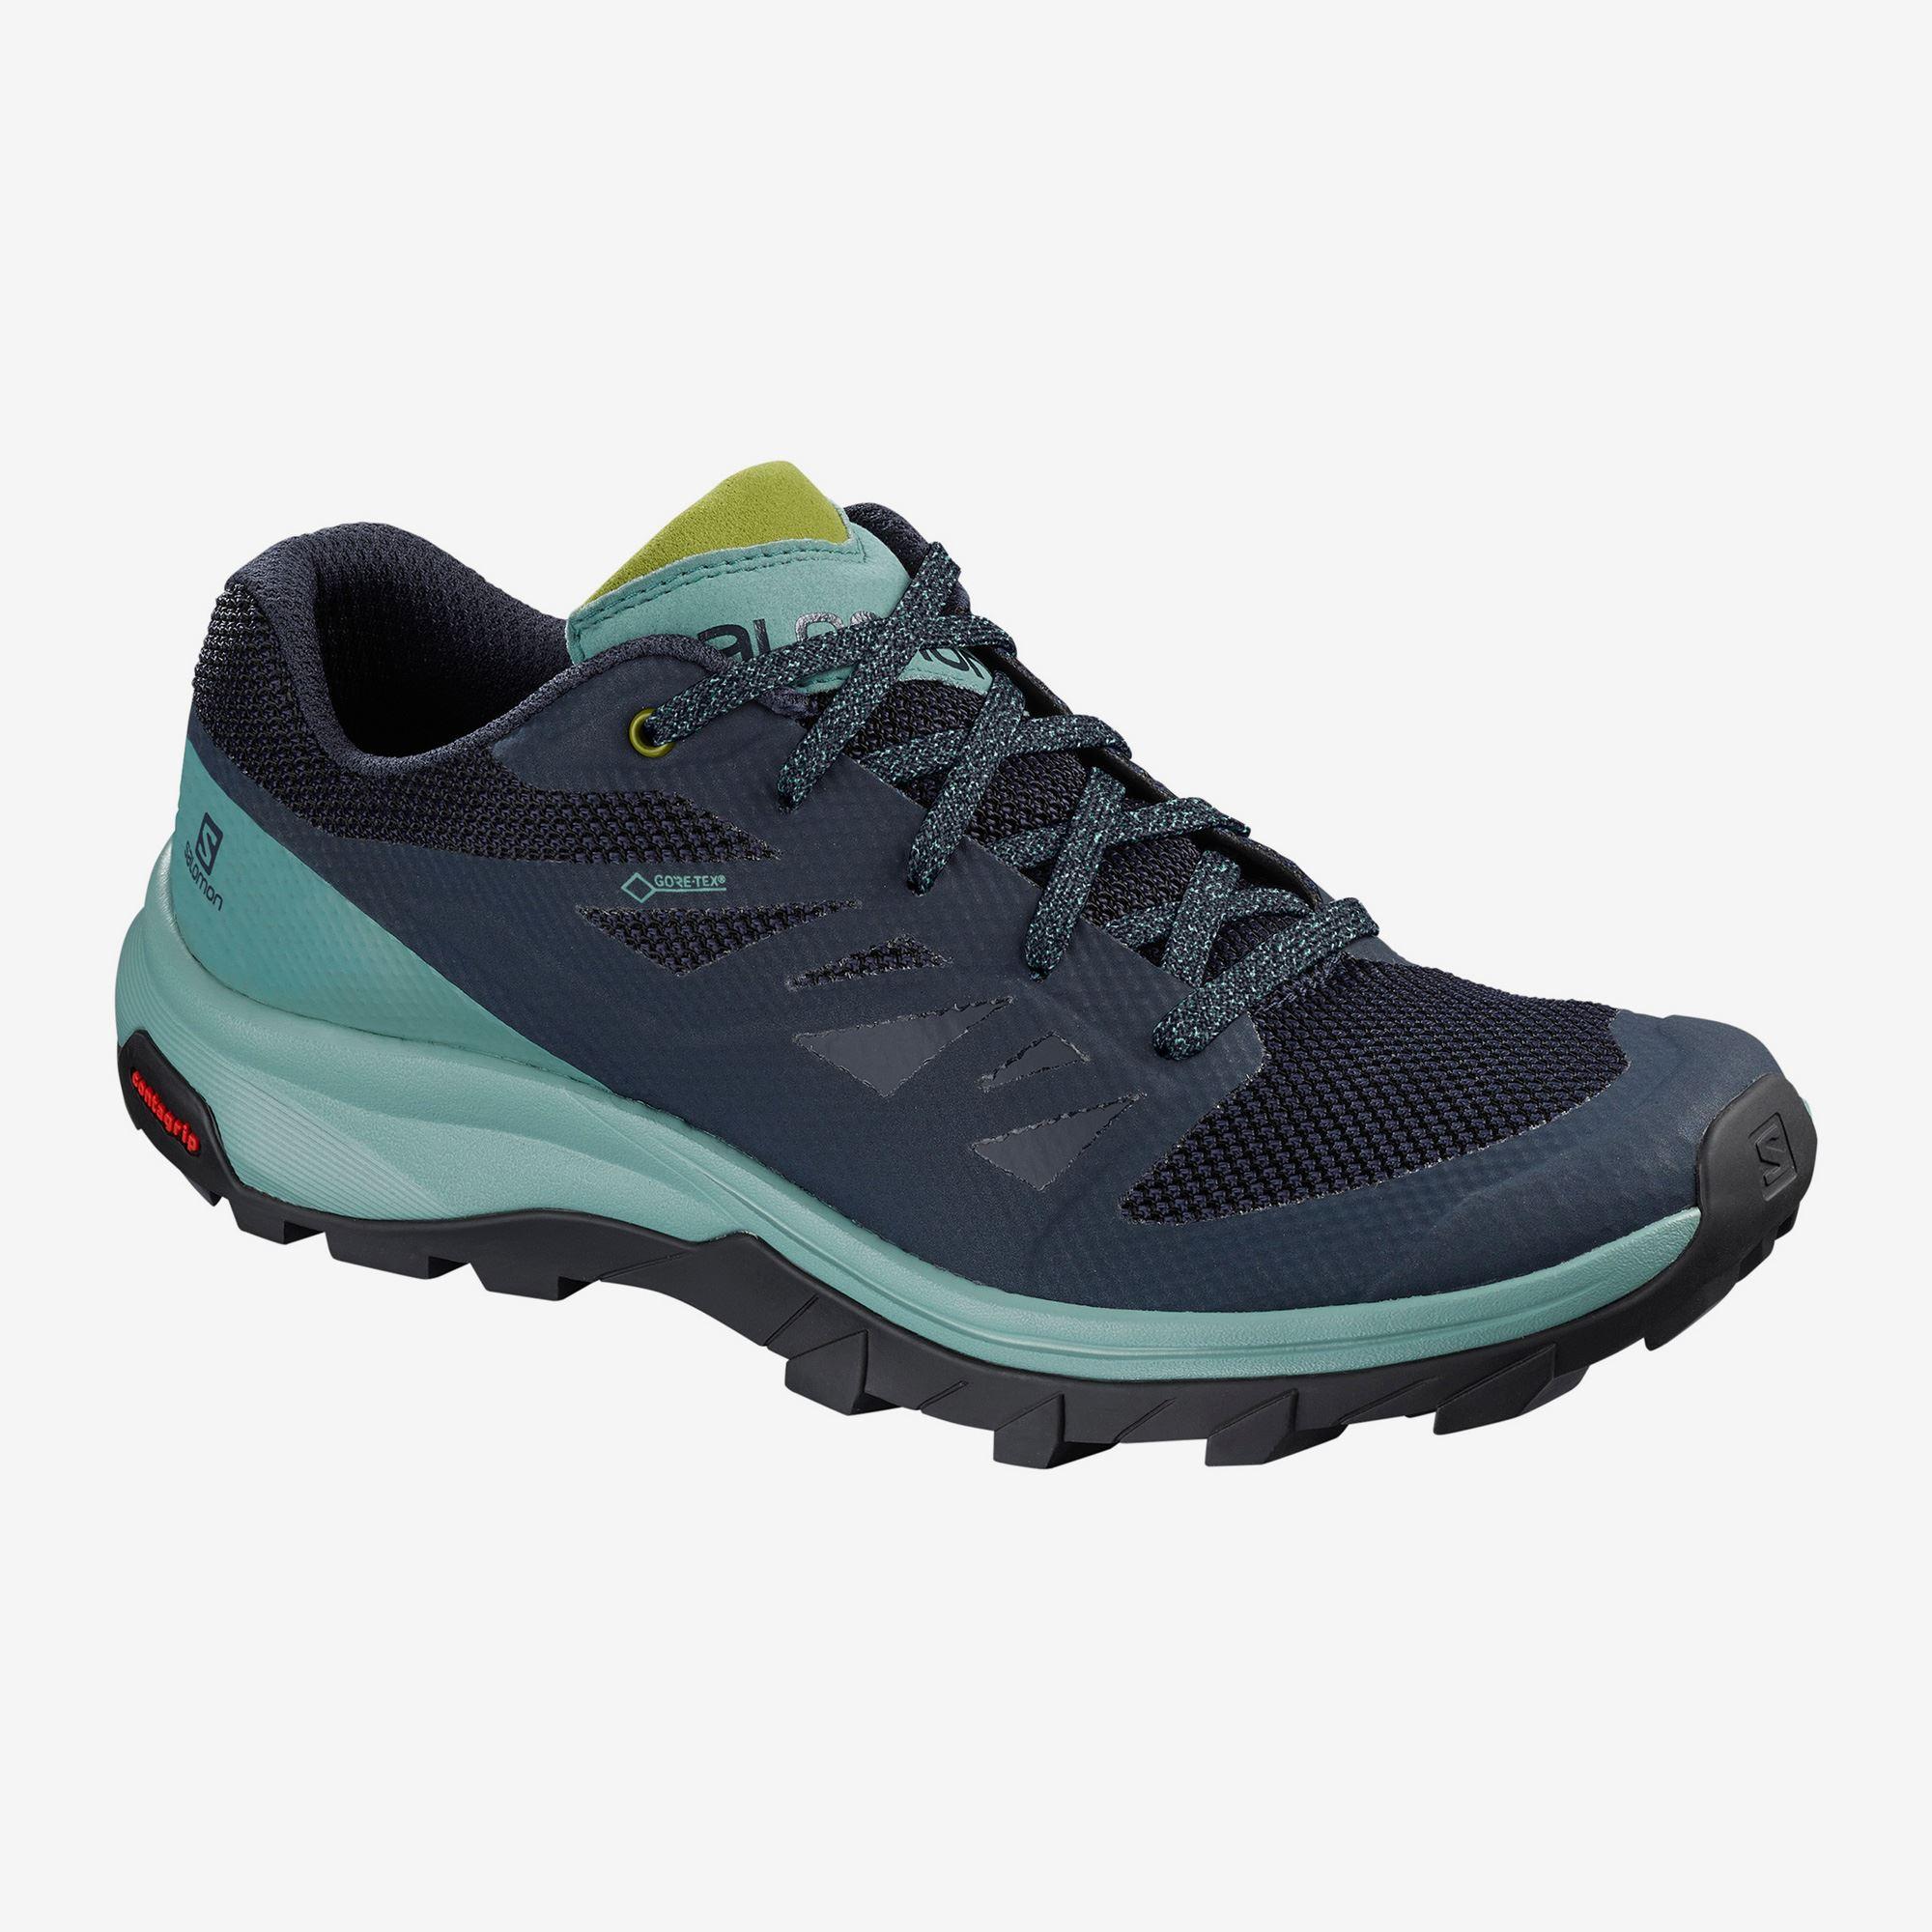 OUTline GTX Shoe - Women's